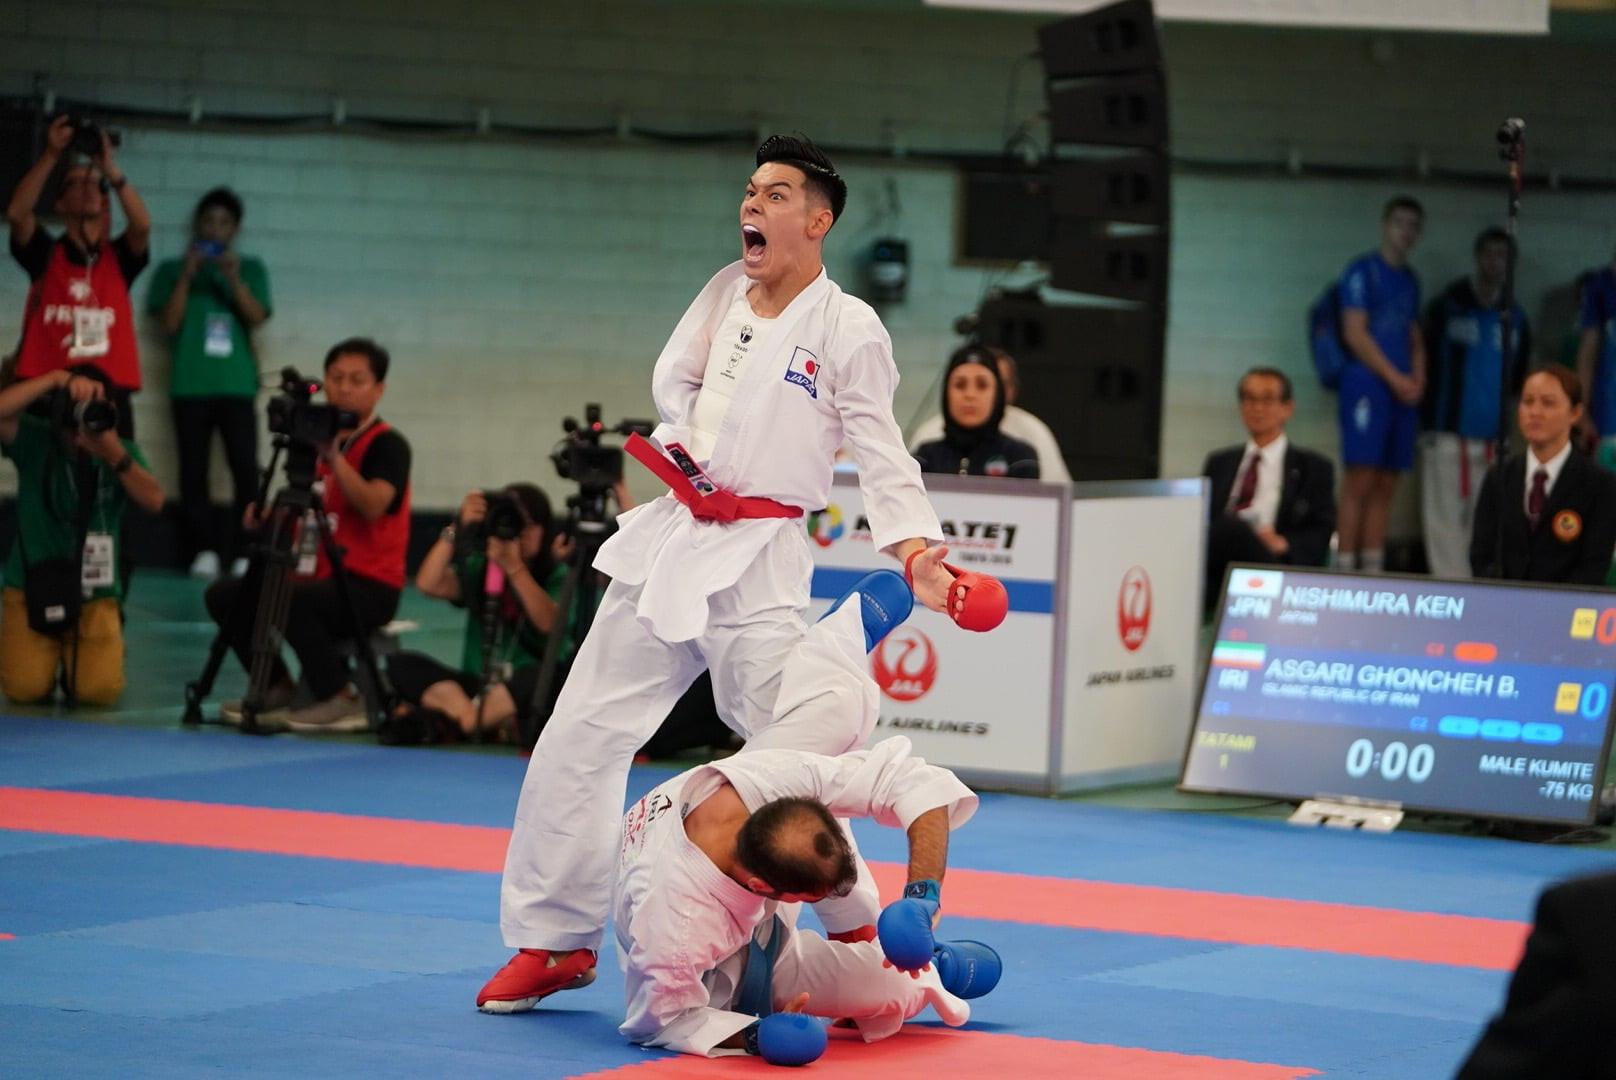 Ken Nishimura of Japan qualified for the men's kumite 75kg final by defeating Iranian Bahman Ghoncheh Asgari by